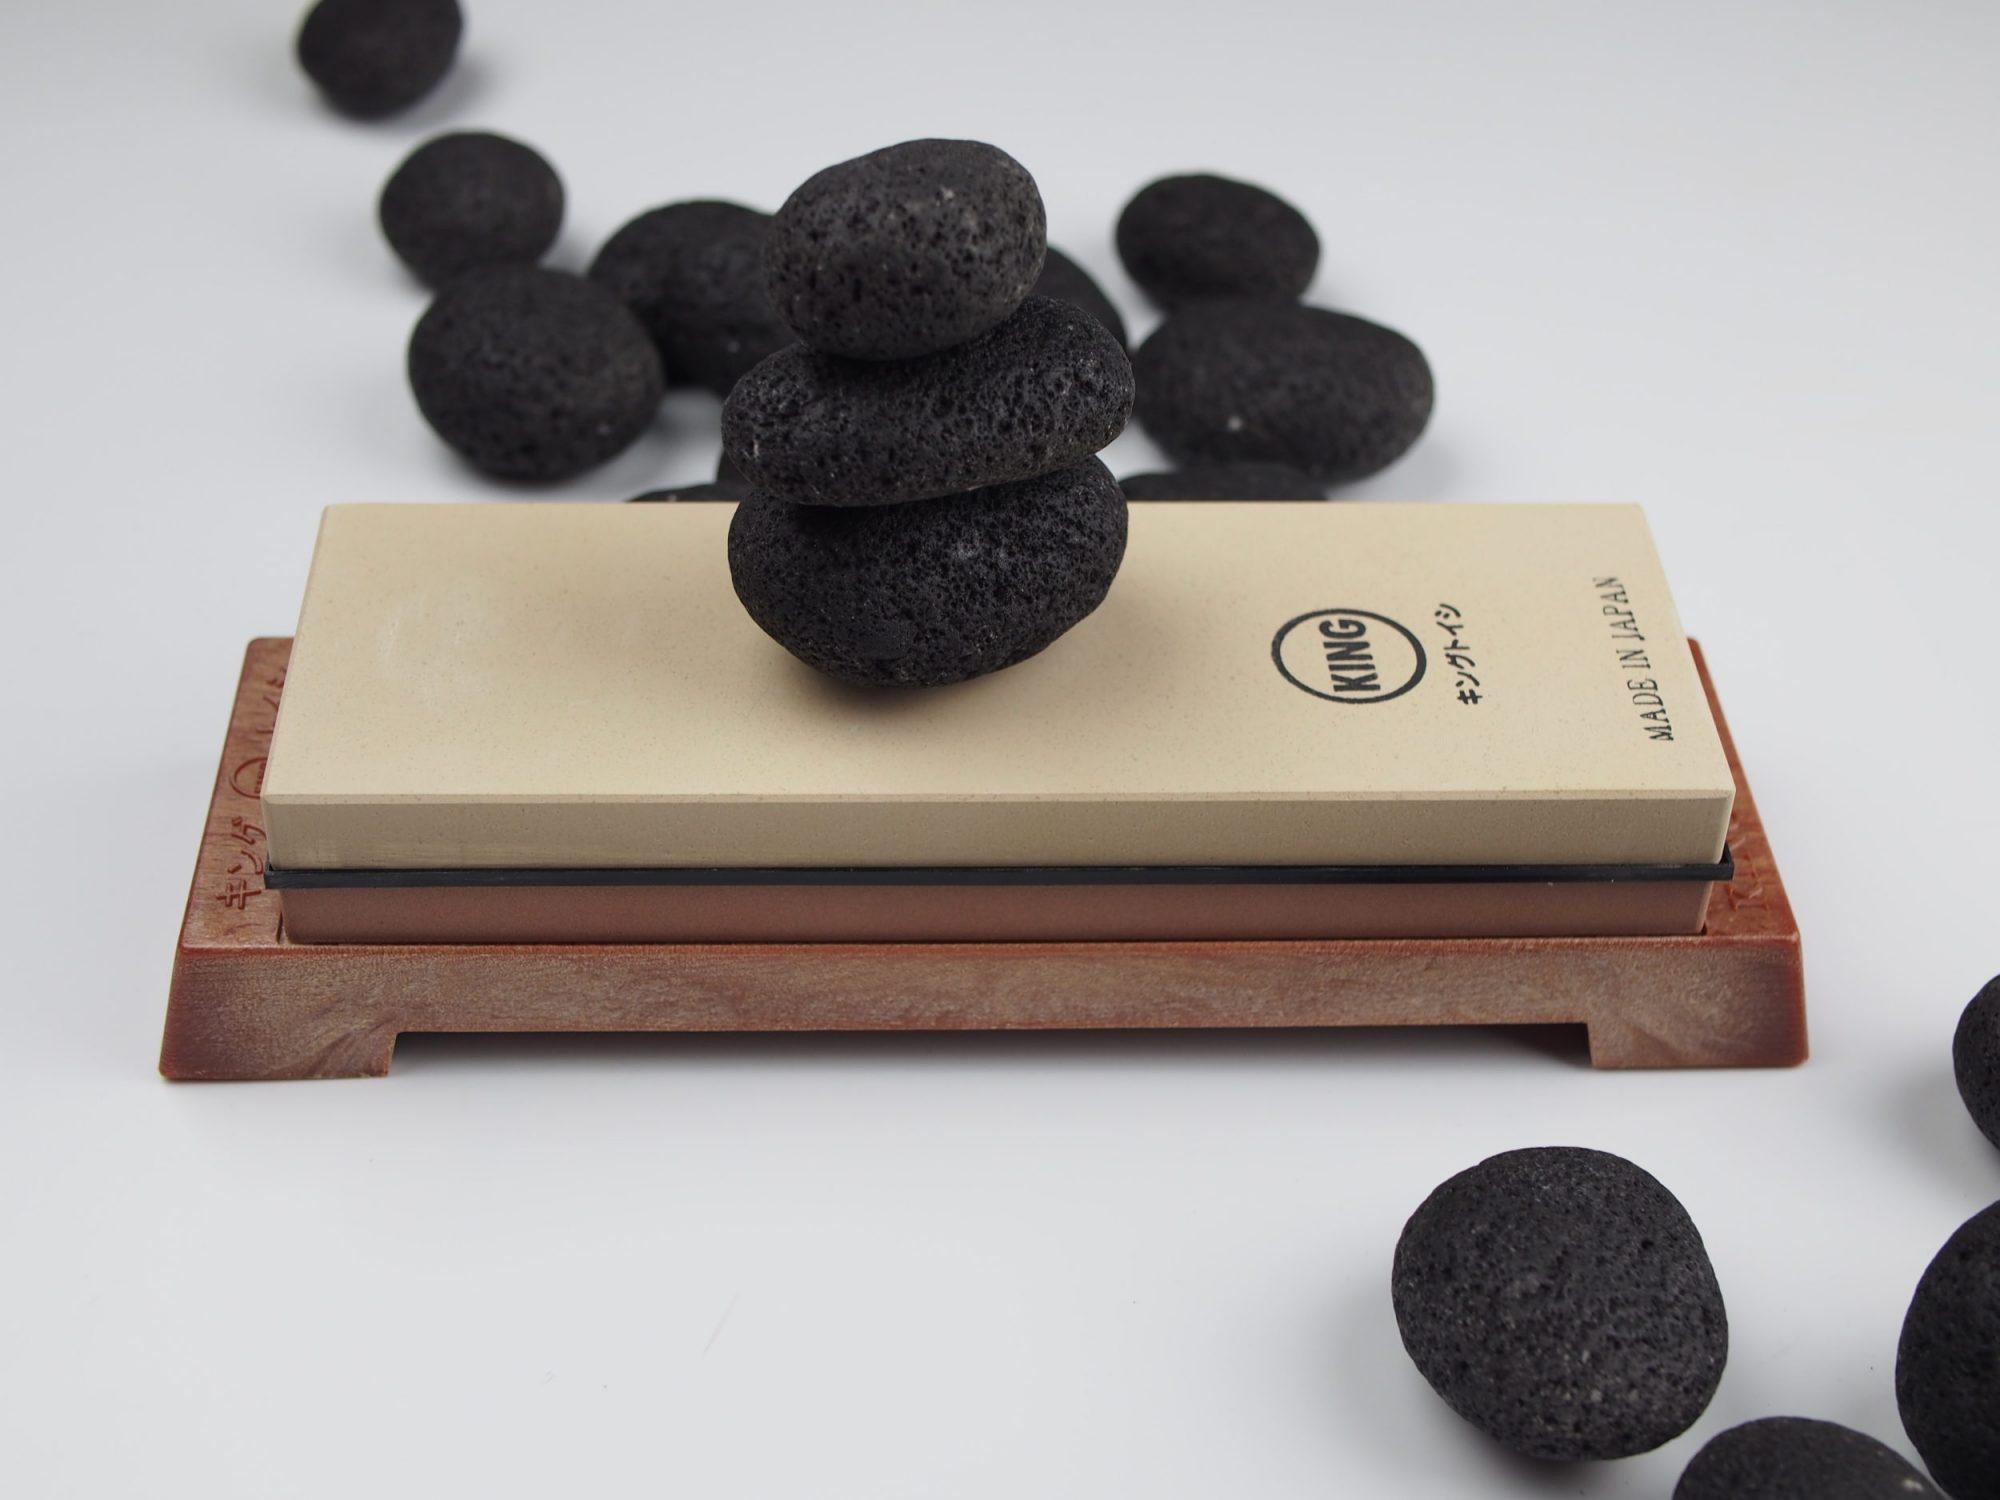 japanese waterstone king sharpening stone 1000/6000 combo